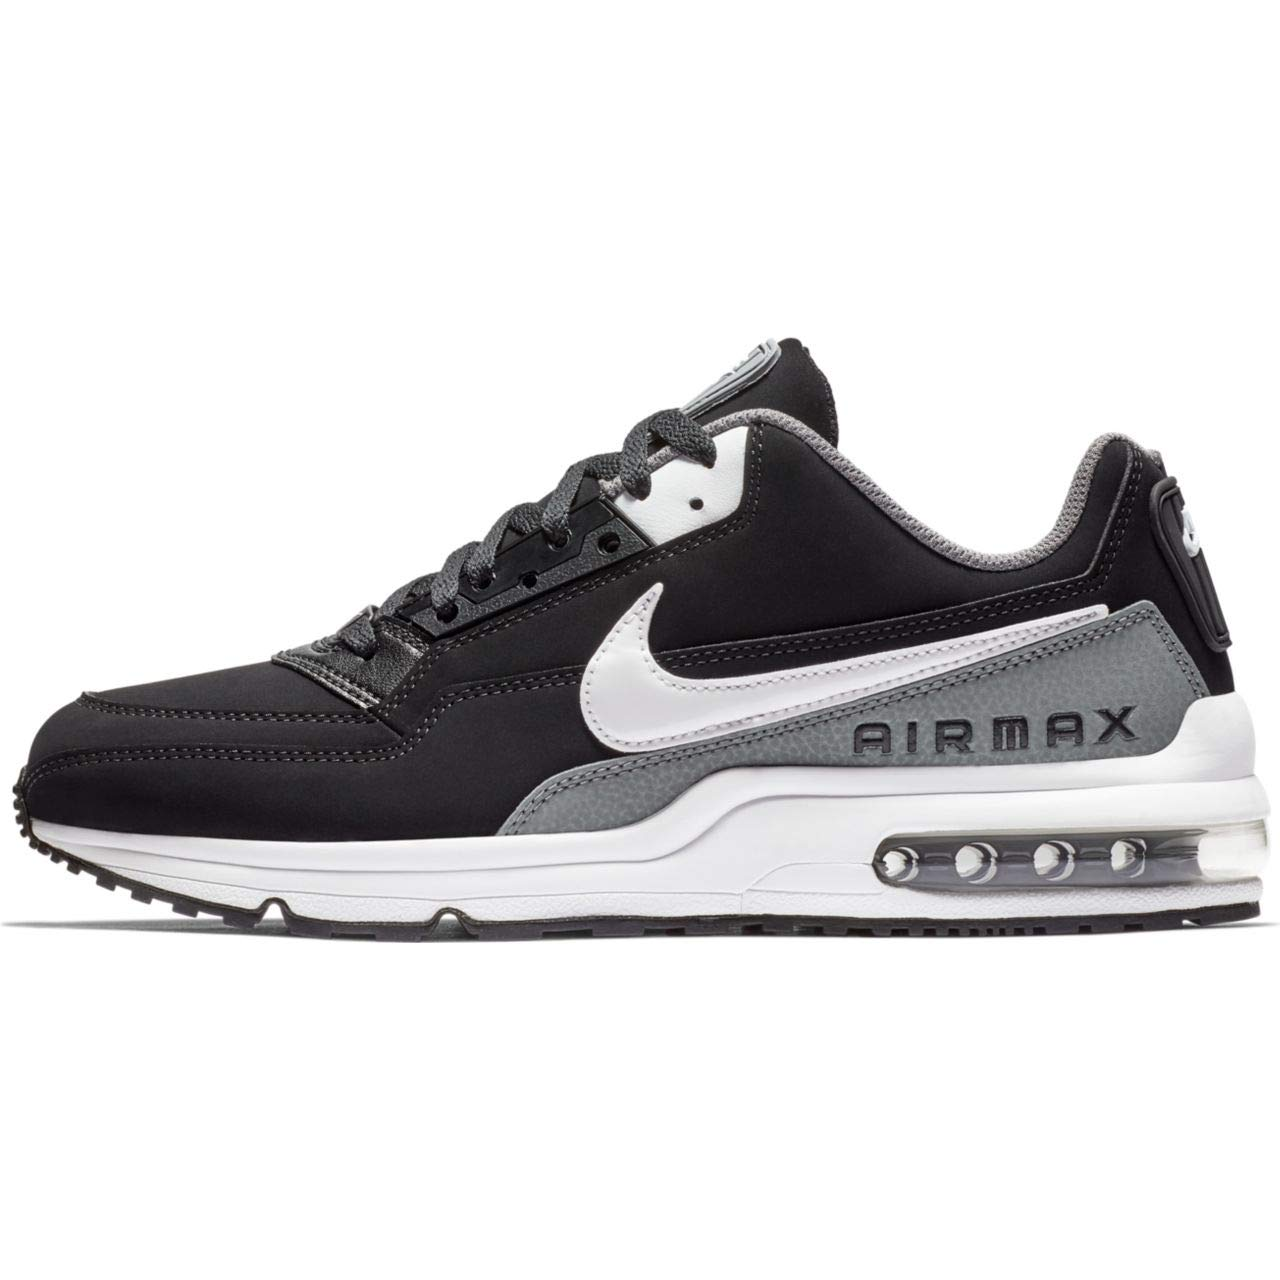 Nike Air Max LTD 3 Men's Shoes BlackDark GreyWhite bv1171 001 (11.5 D(M) US)